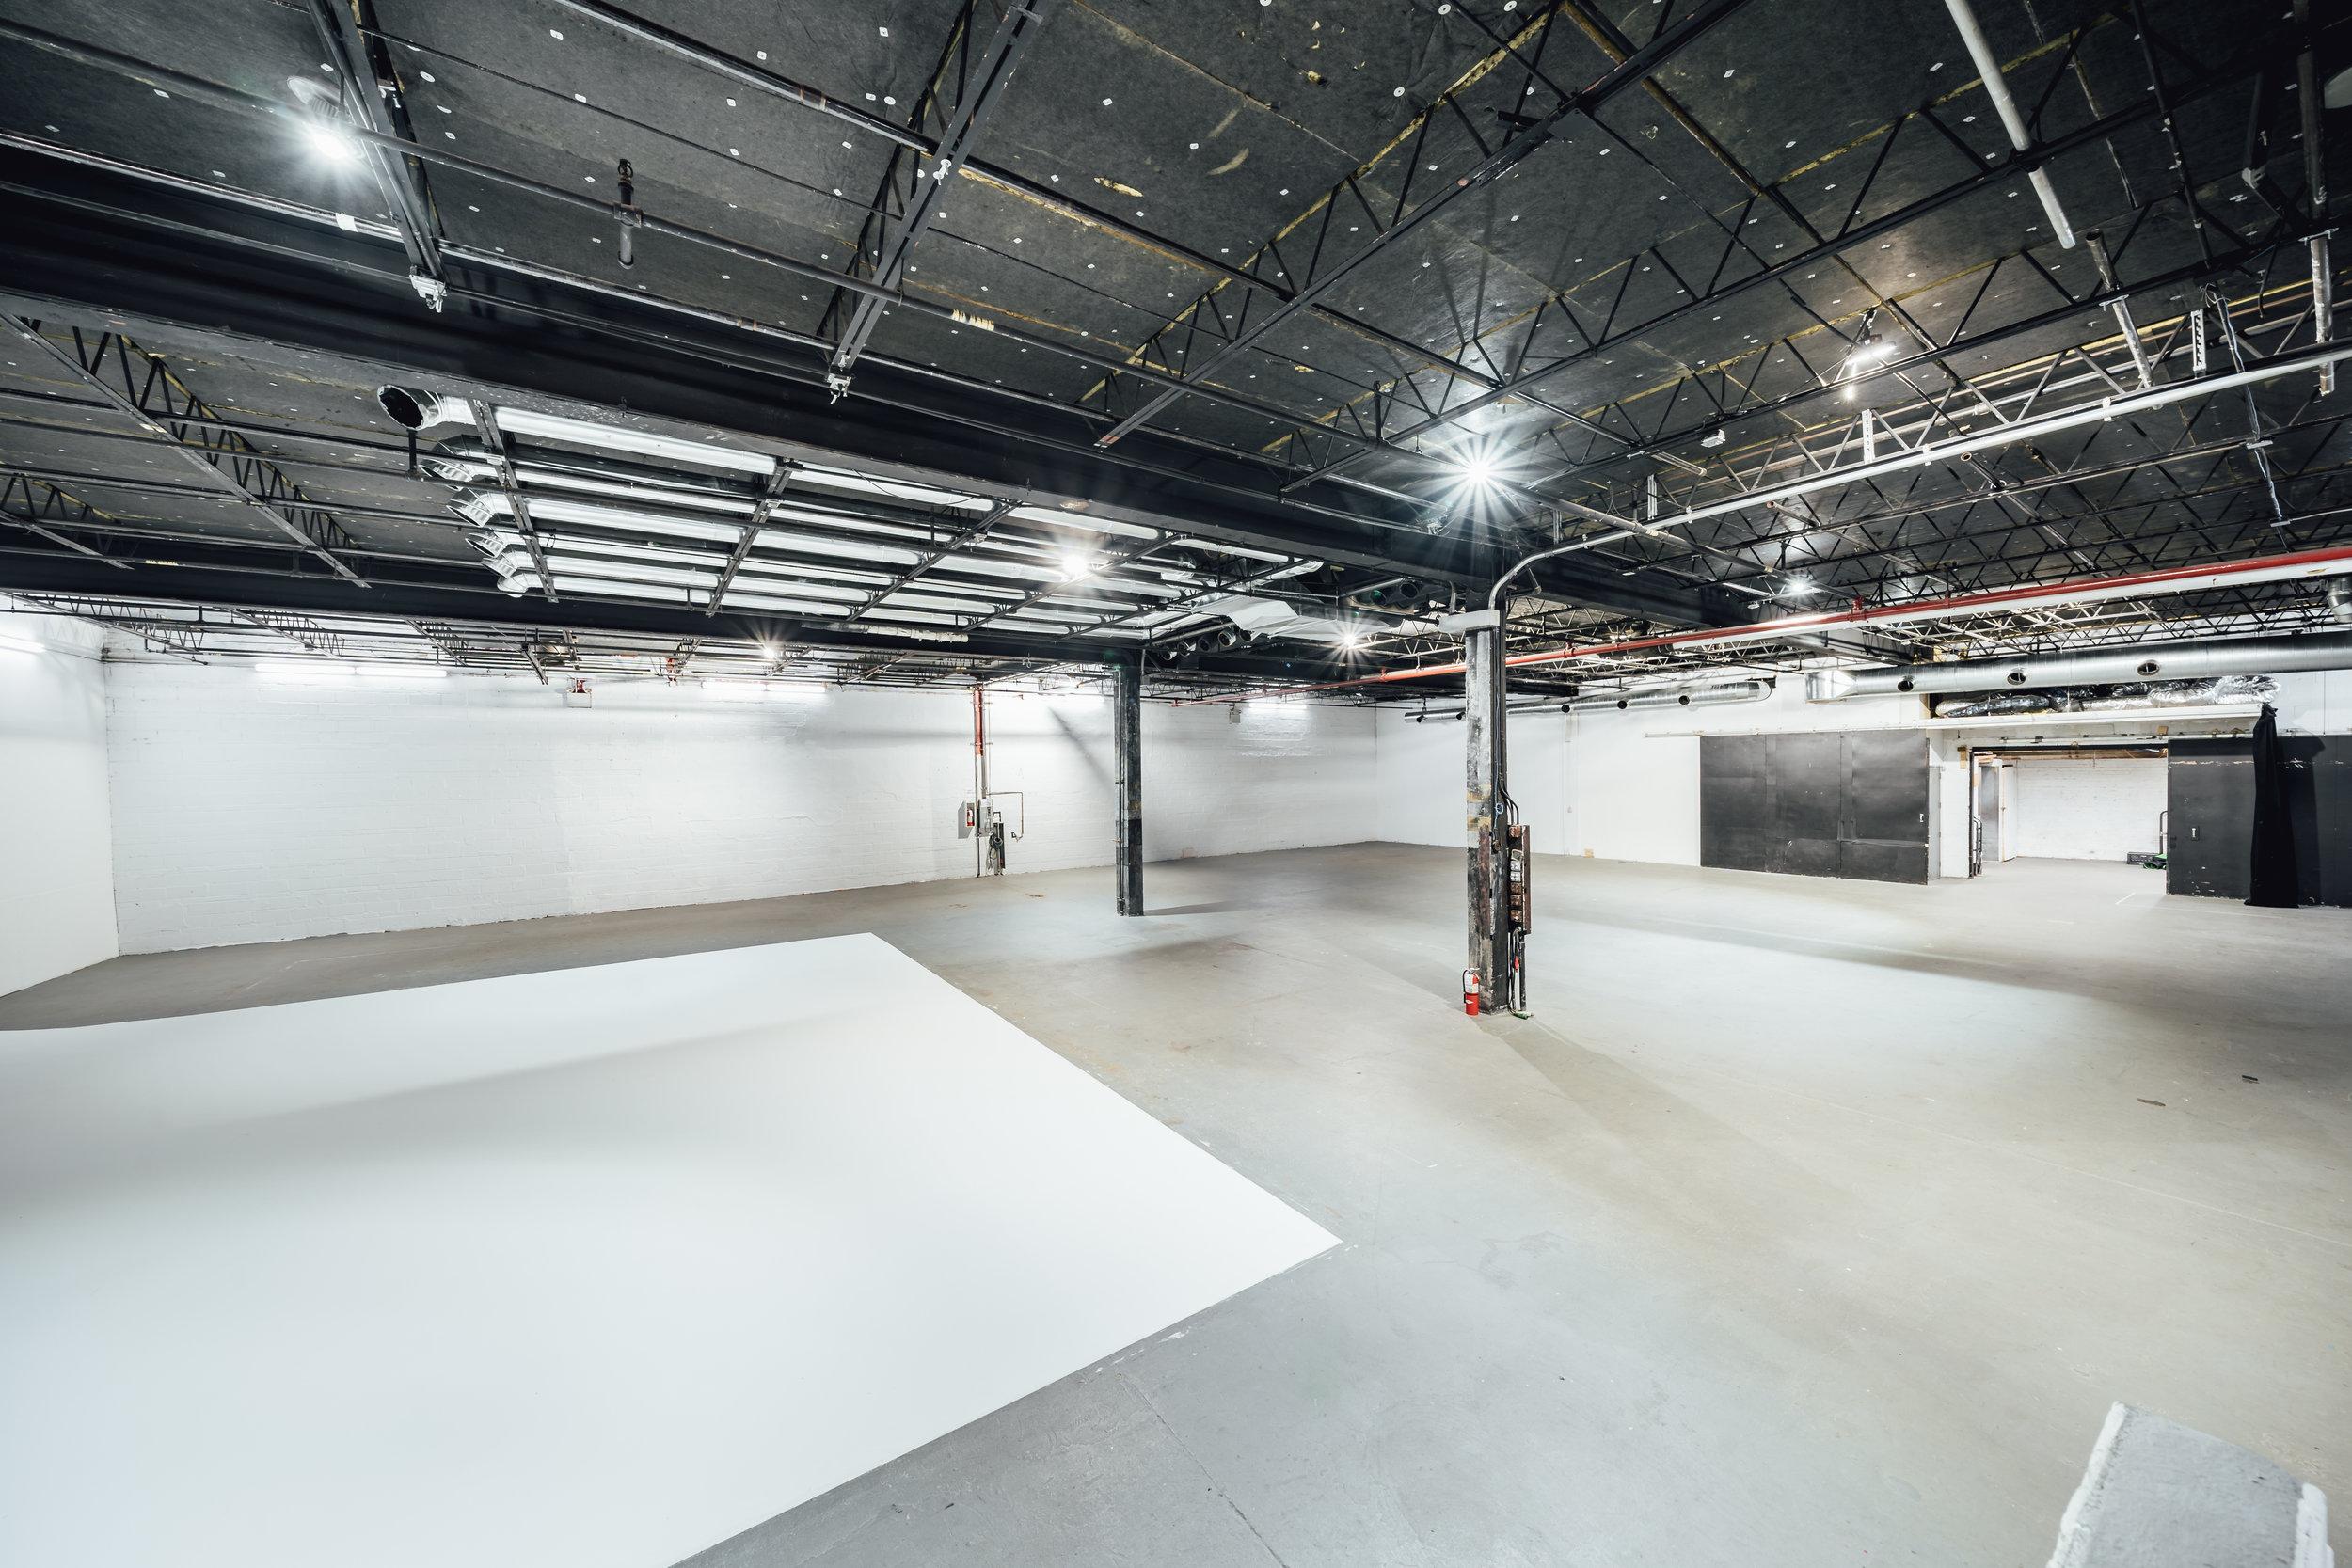 Studio 5: White Cyc Stage - One Wall Cyc